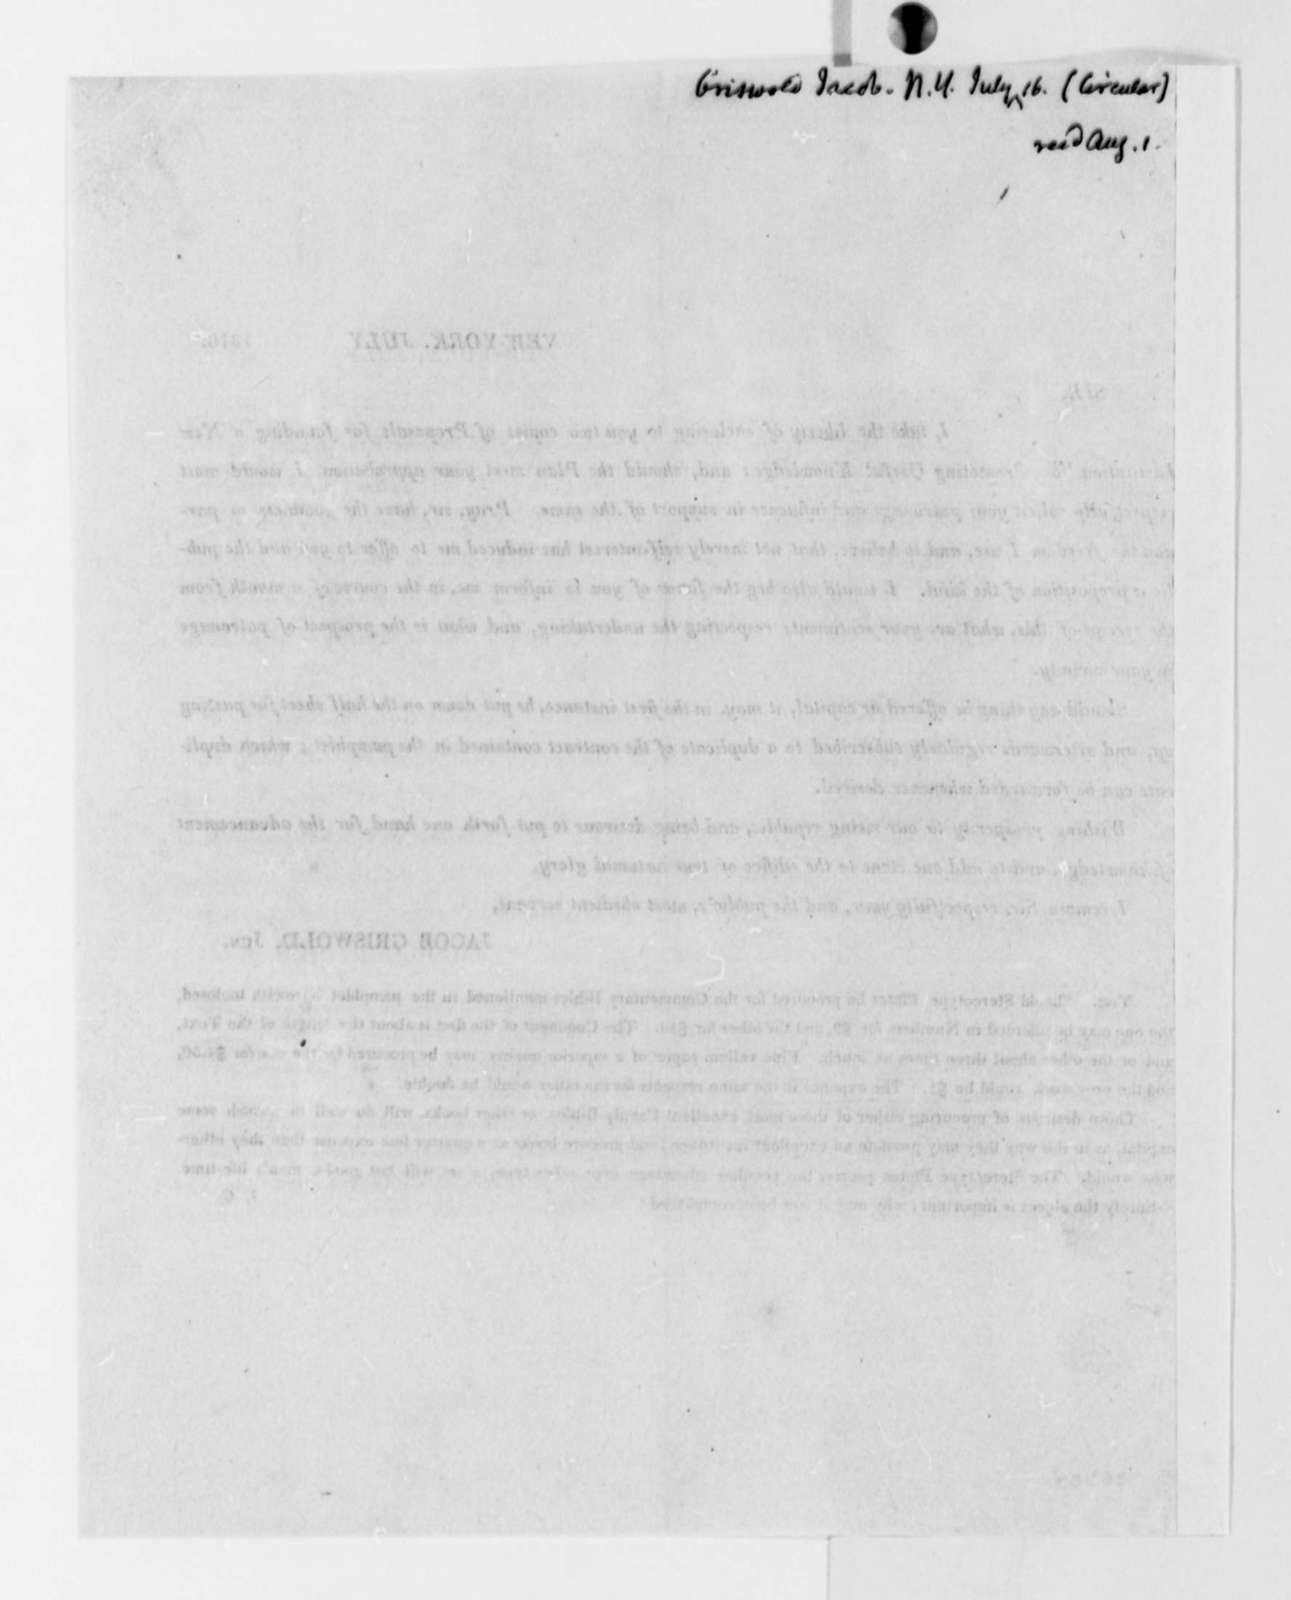 Jacob Griswold, Jr. to Thomas Jefferson, July 16, 1816, Broadside